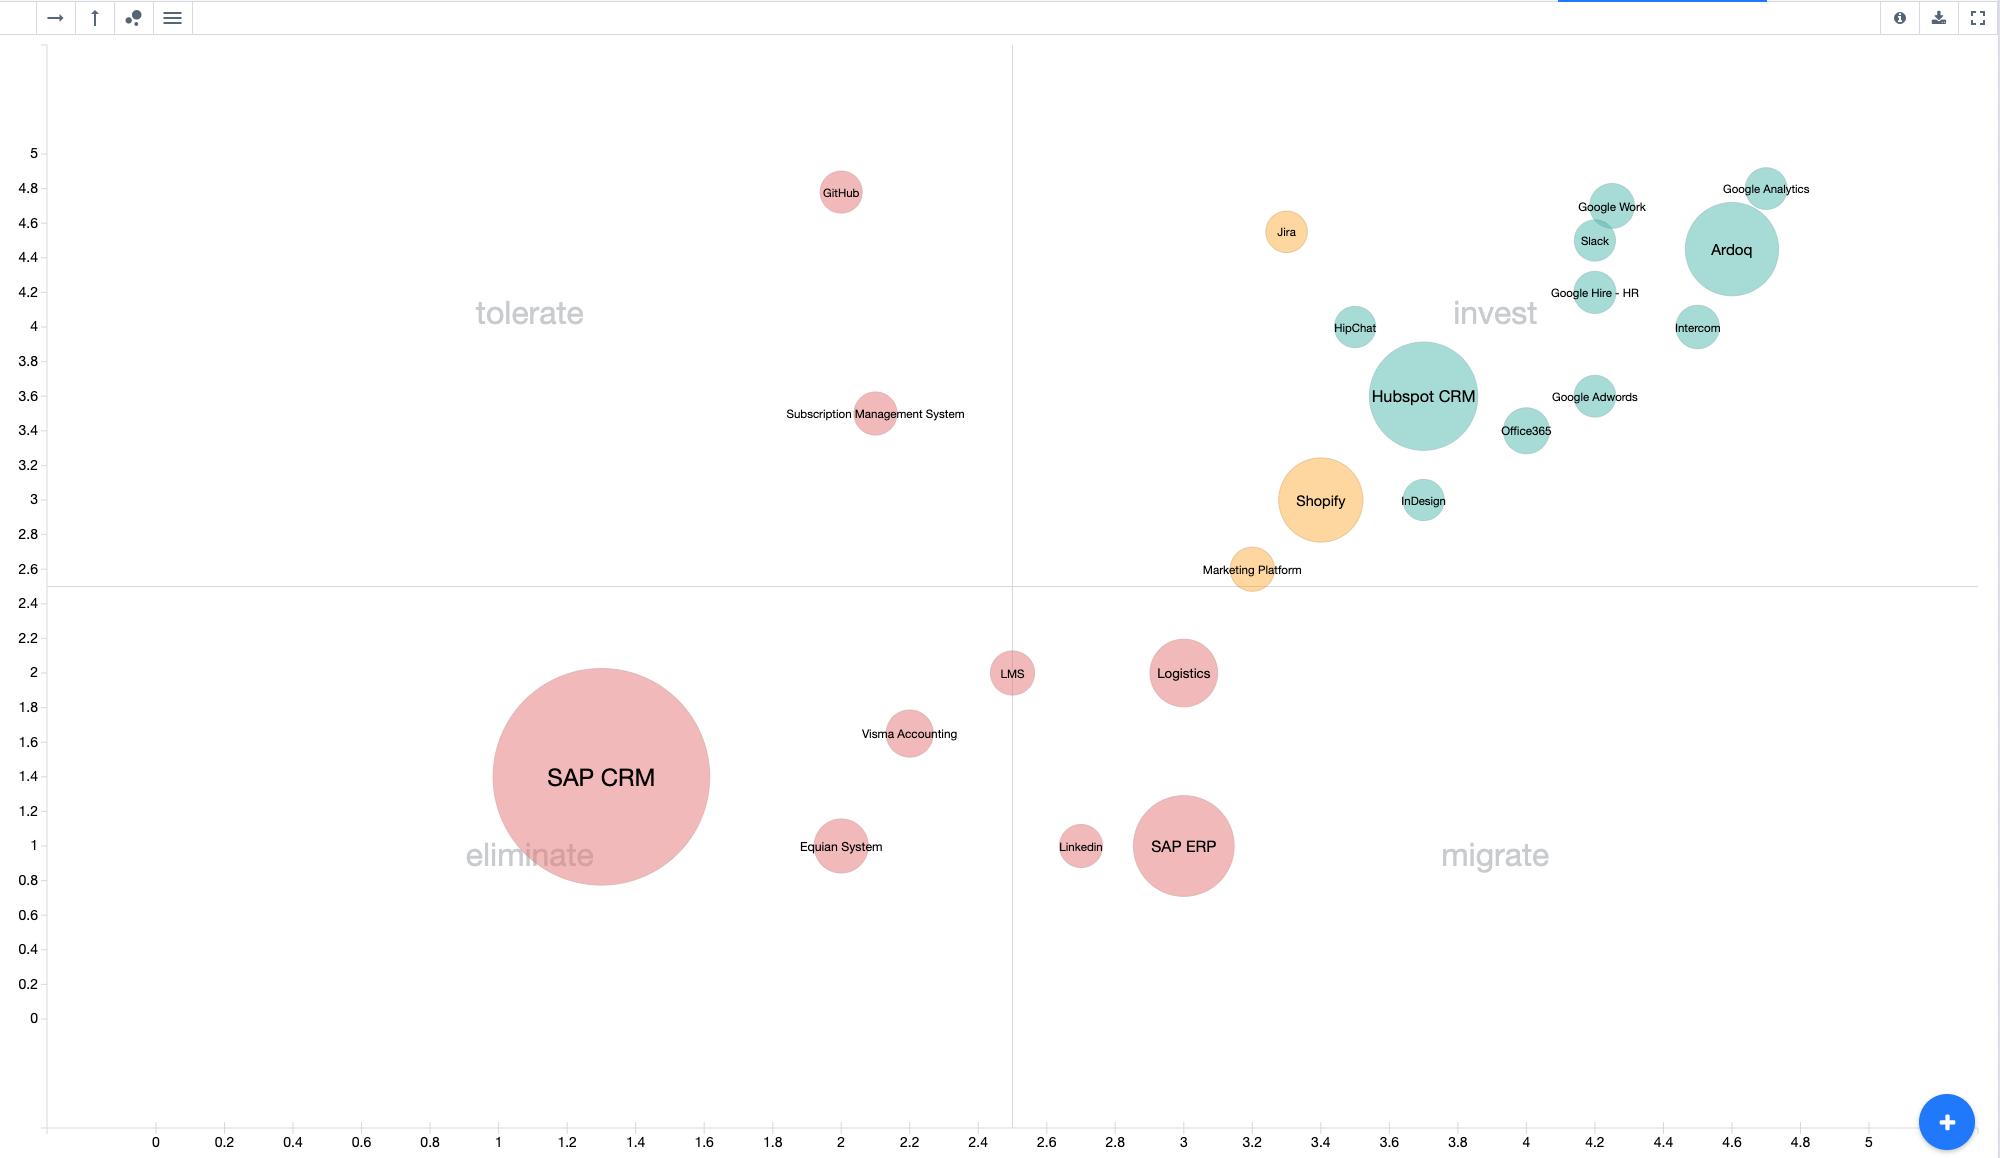 Ardoq bubble chart